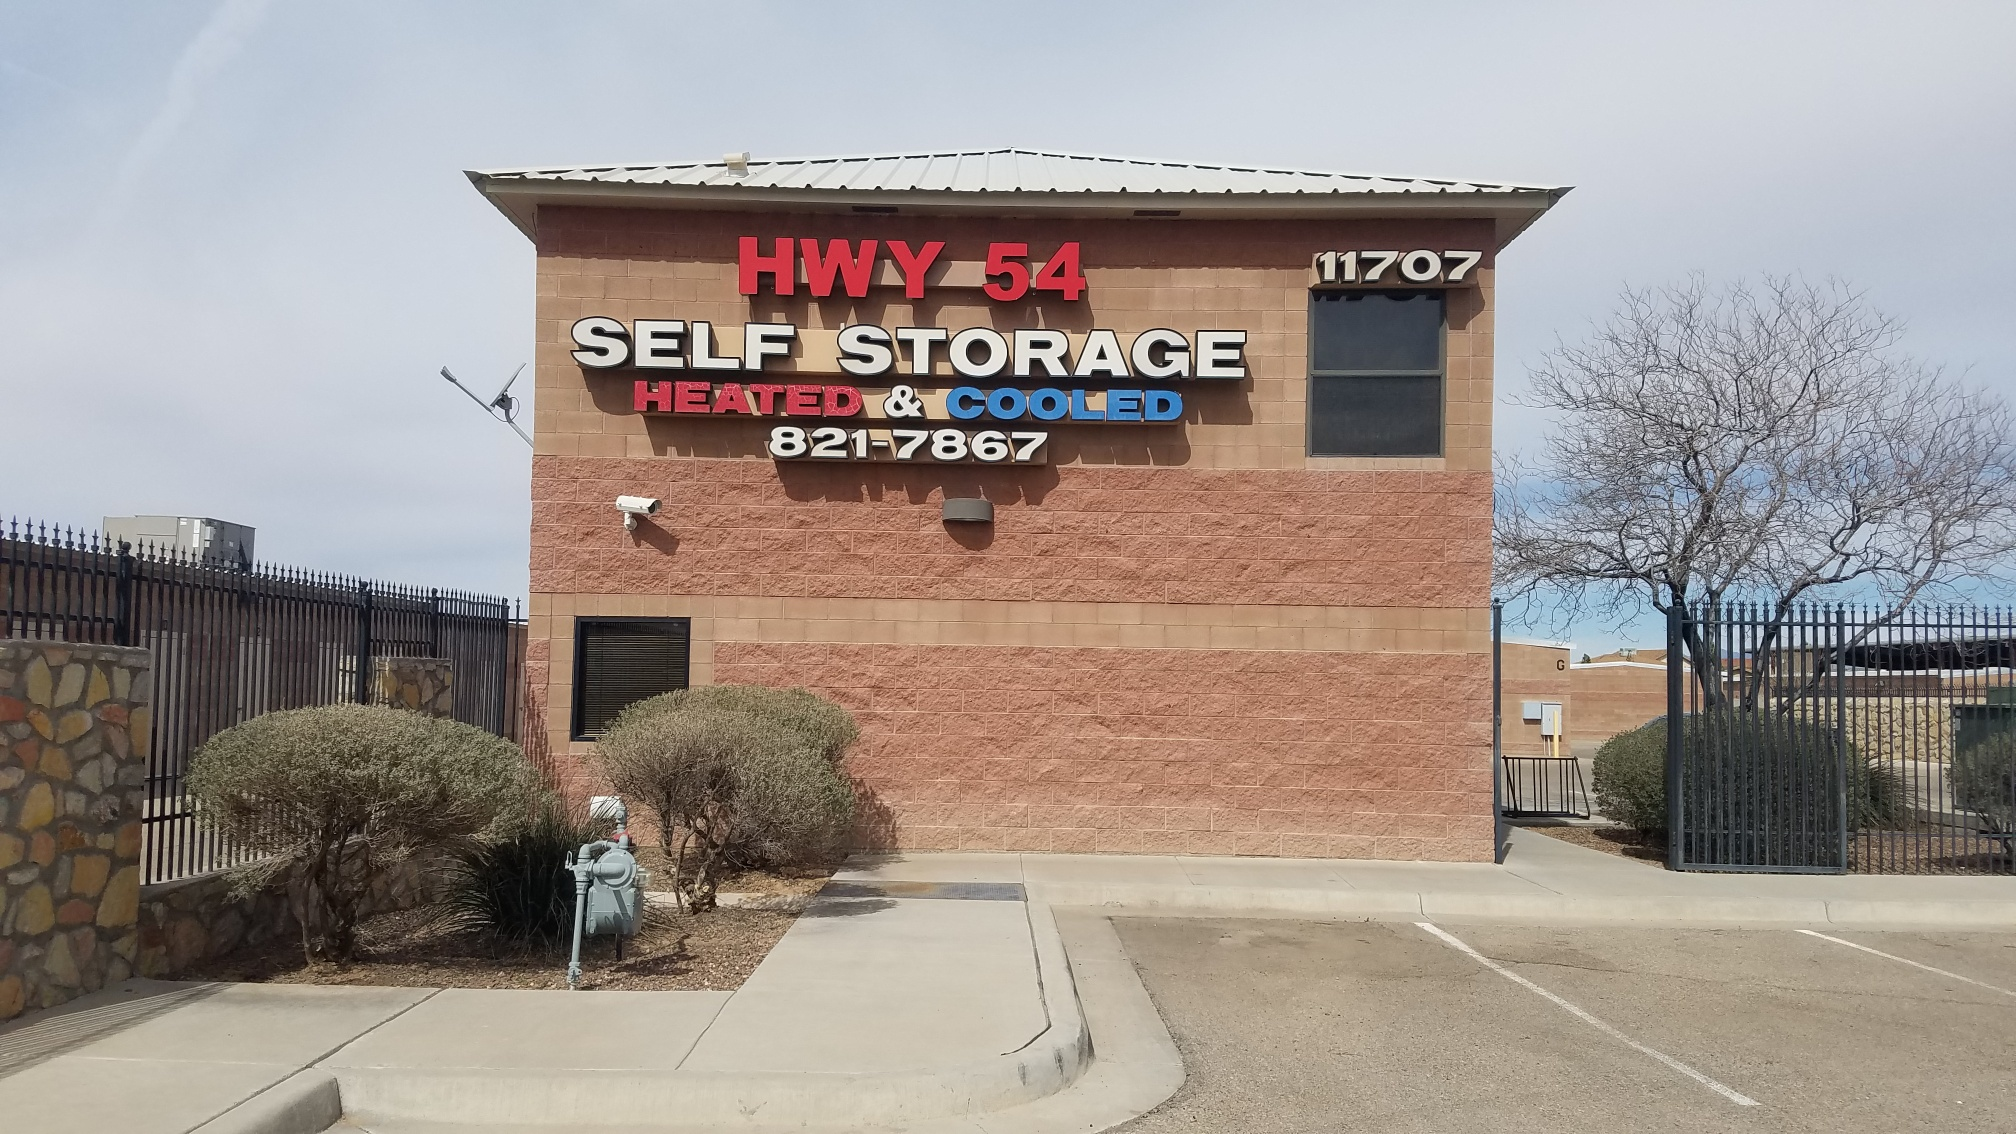 Hwy 54 Self Storage